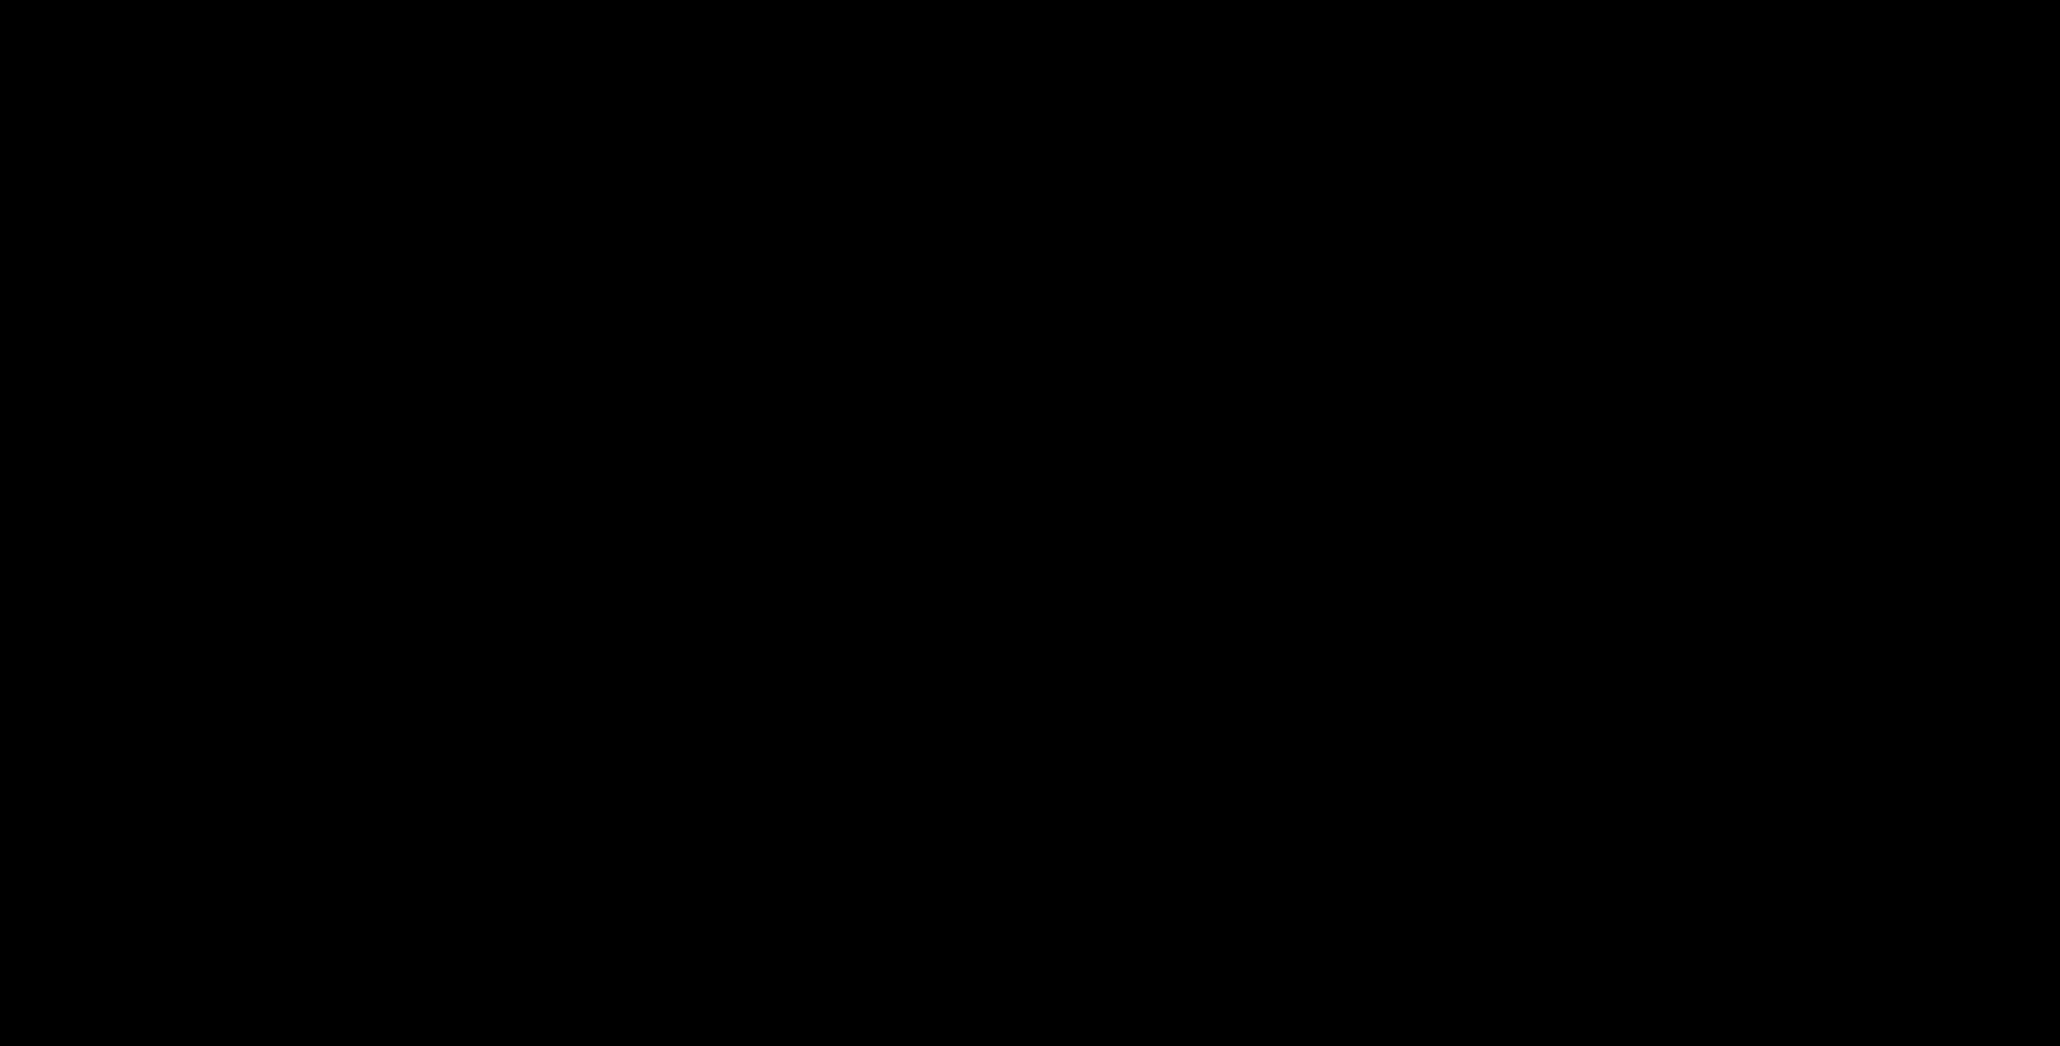 N-Feruloylserotonin